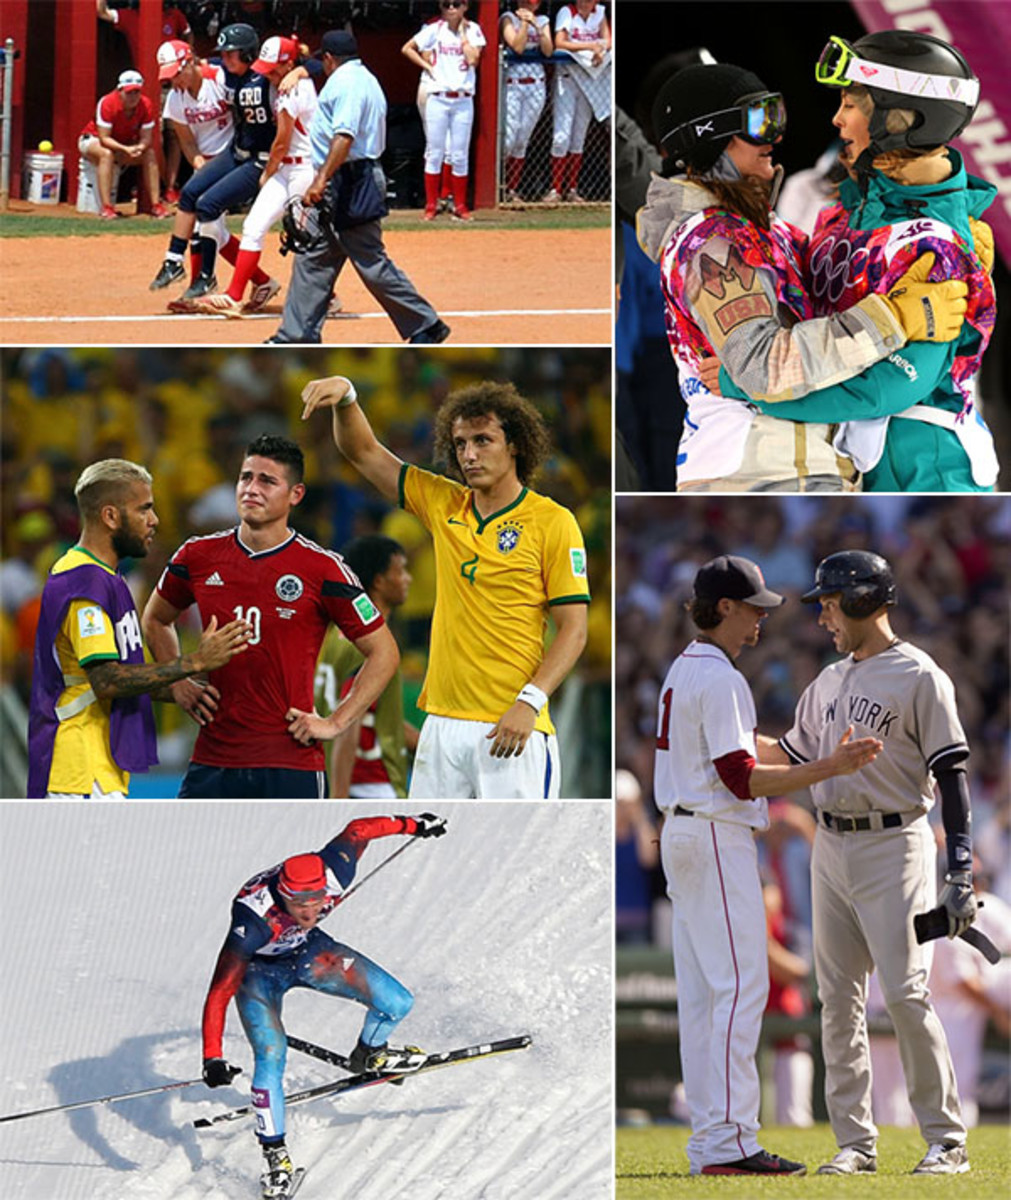 2014 sportsmanship moments